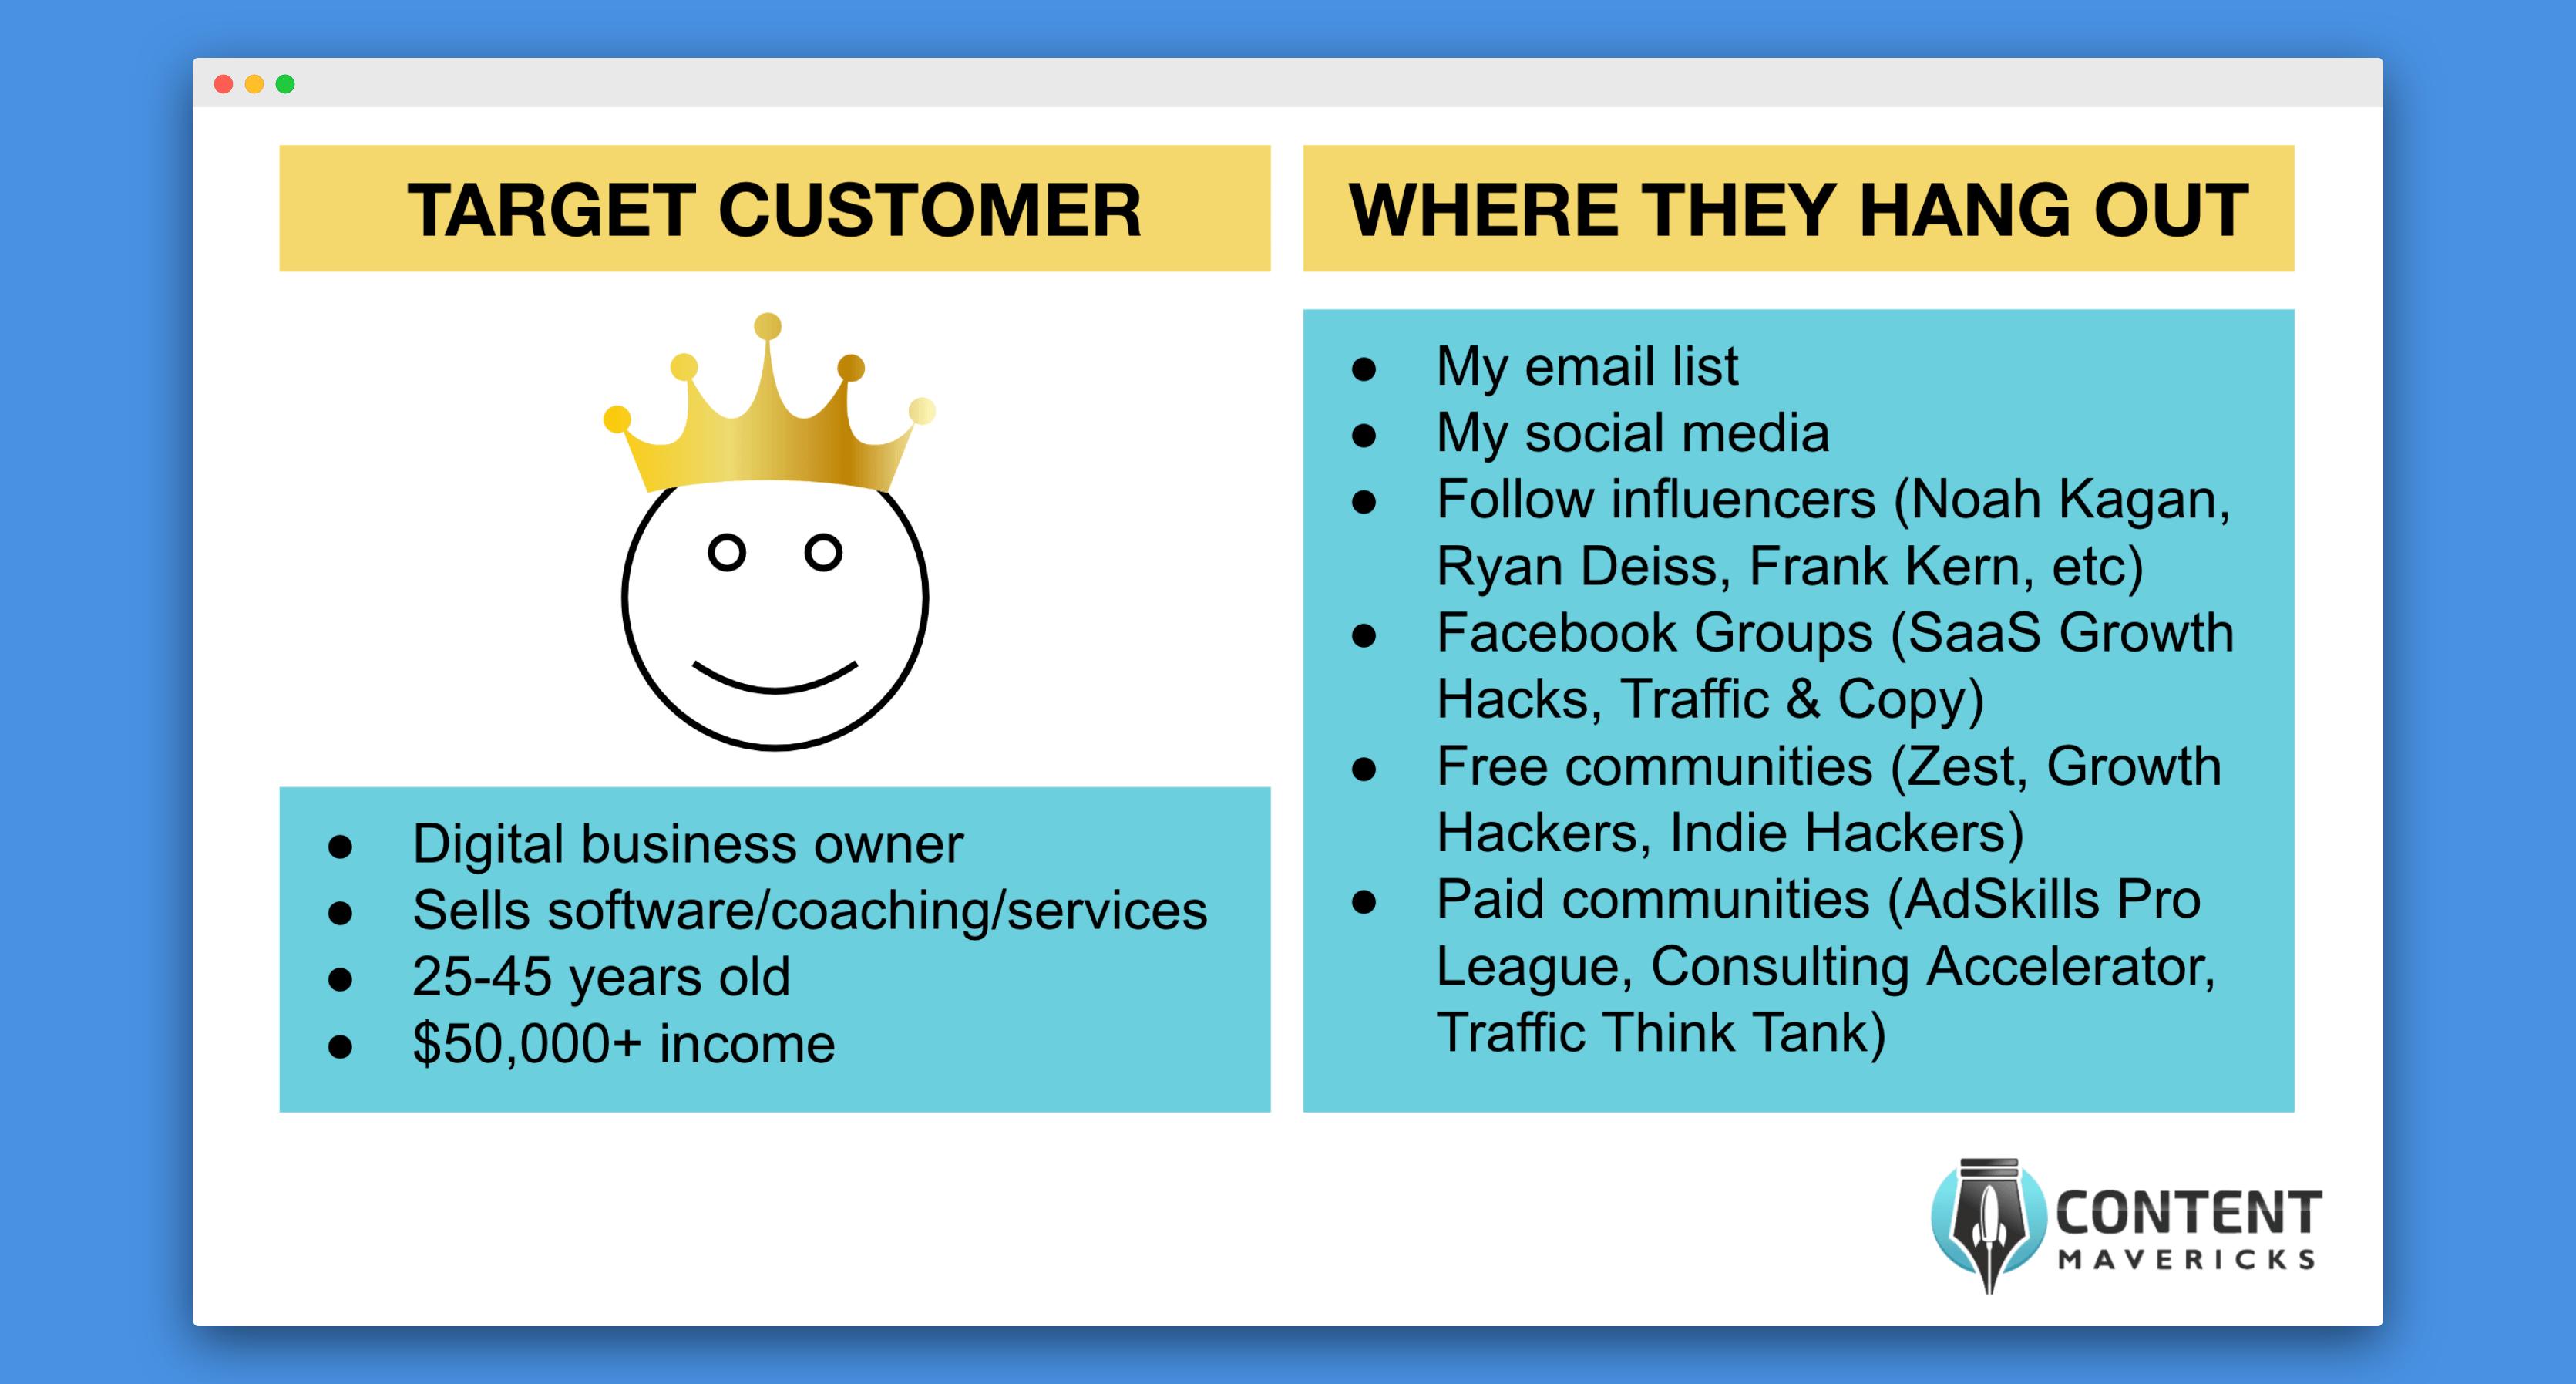 target customer hang outs image